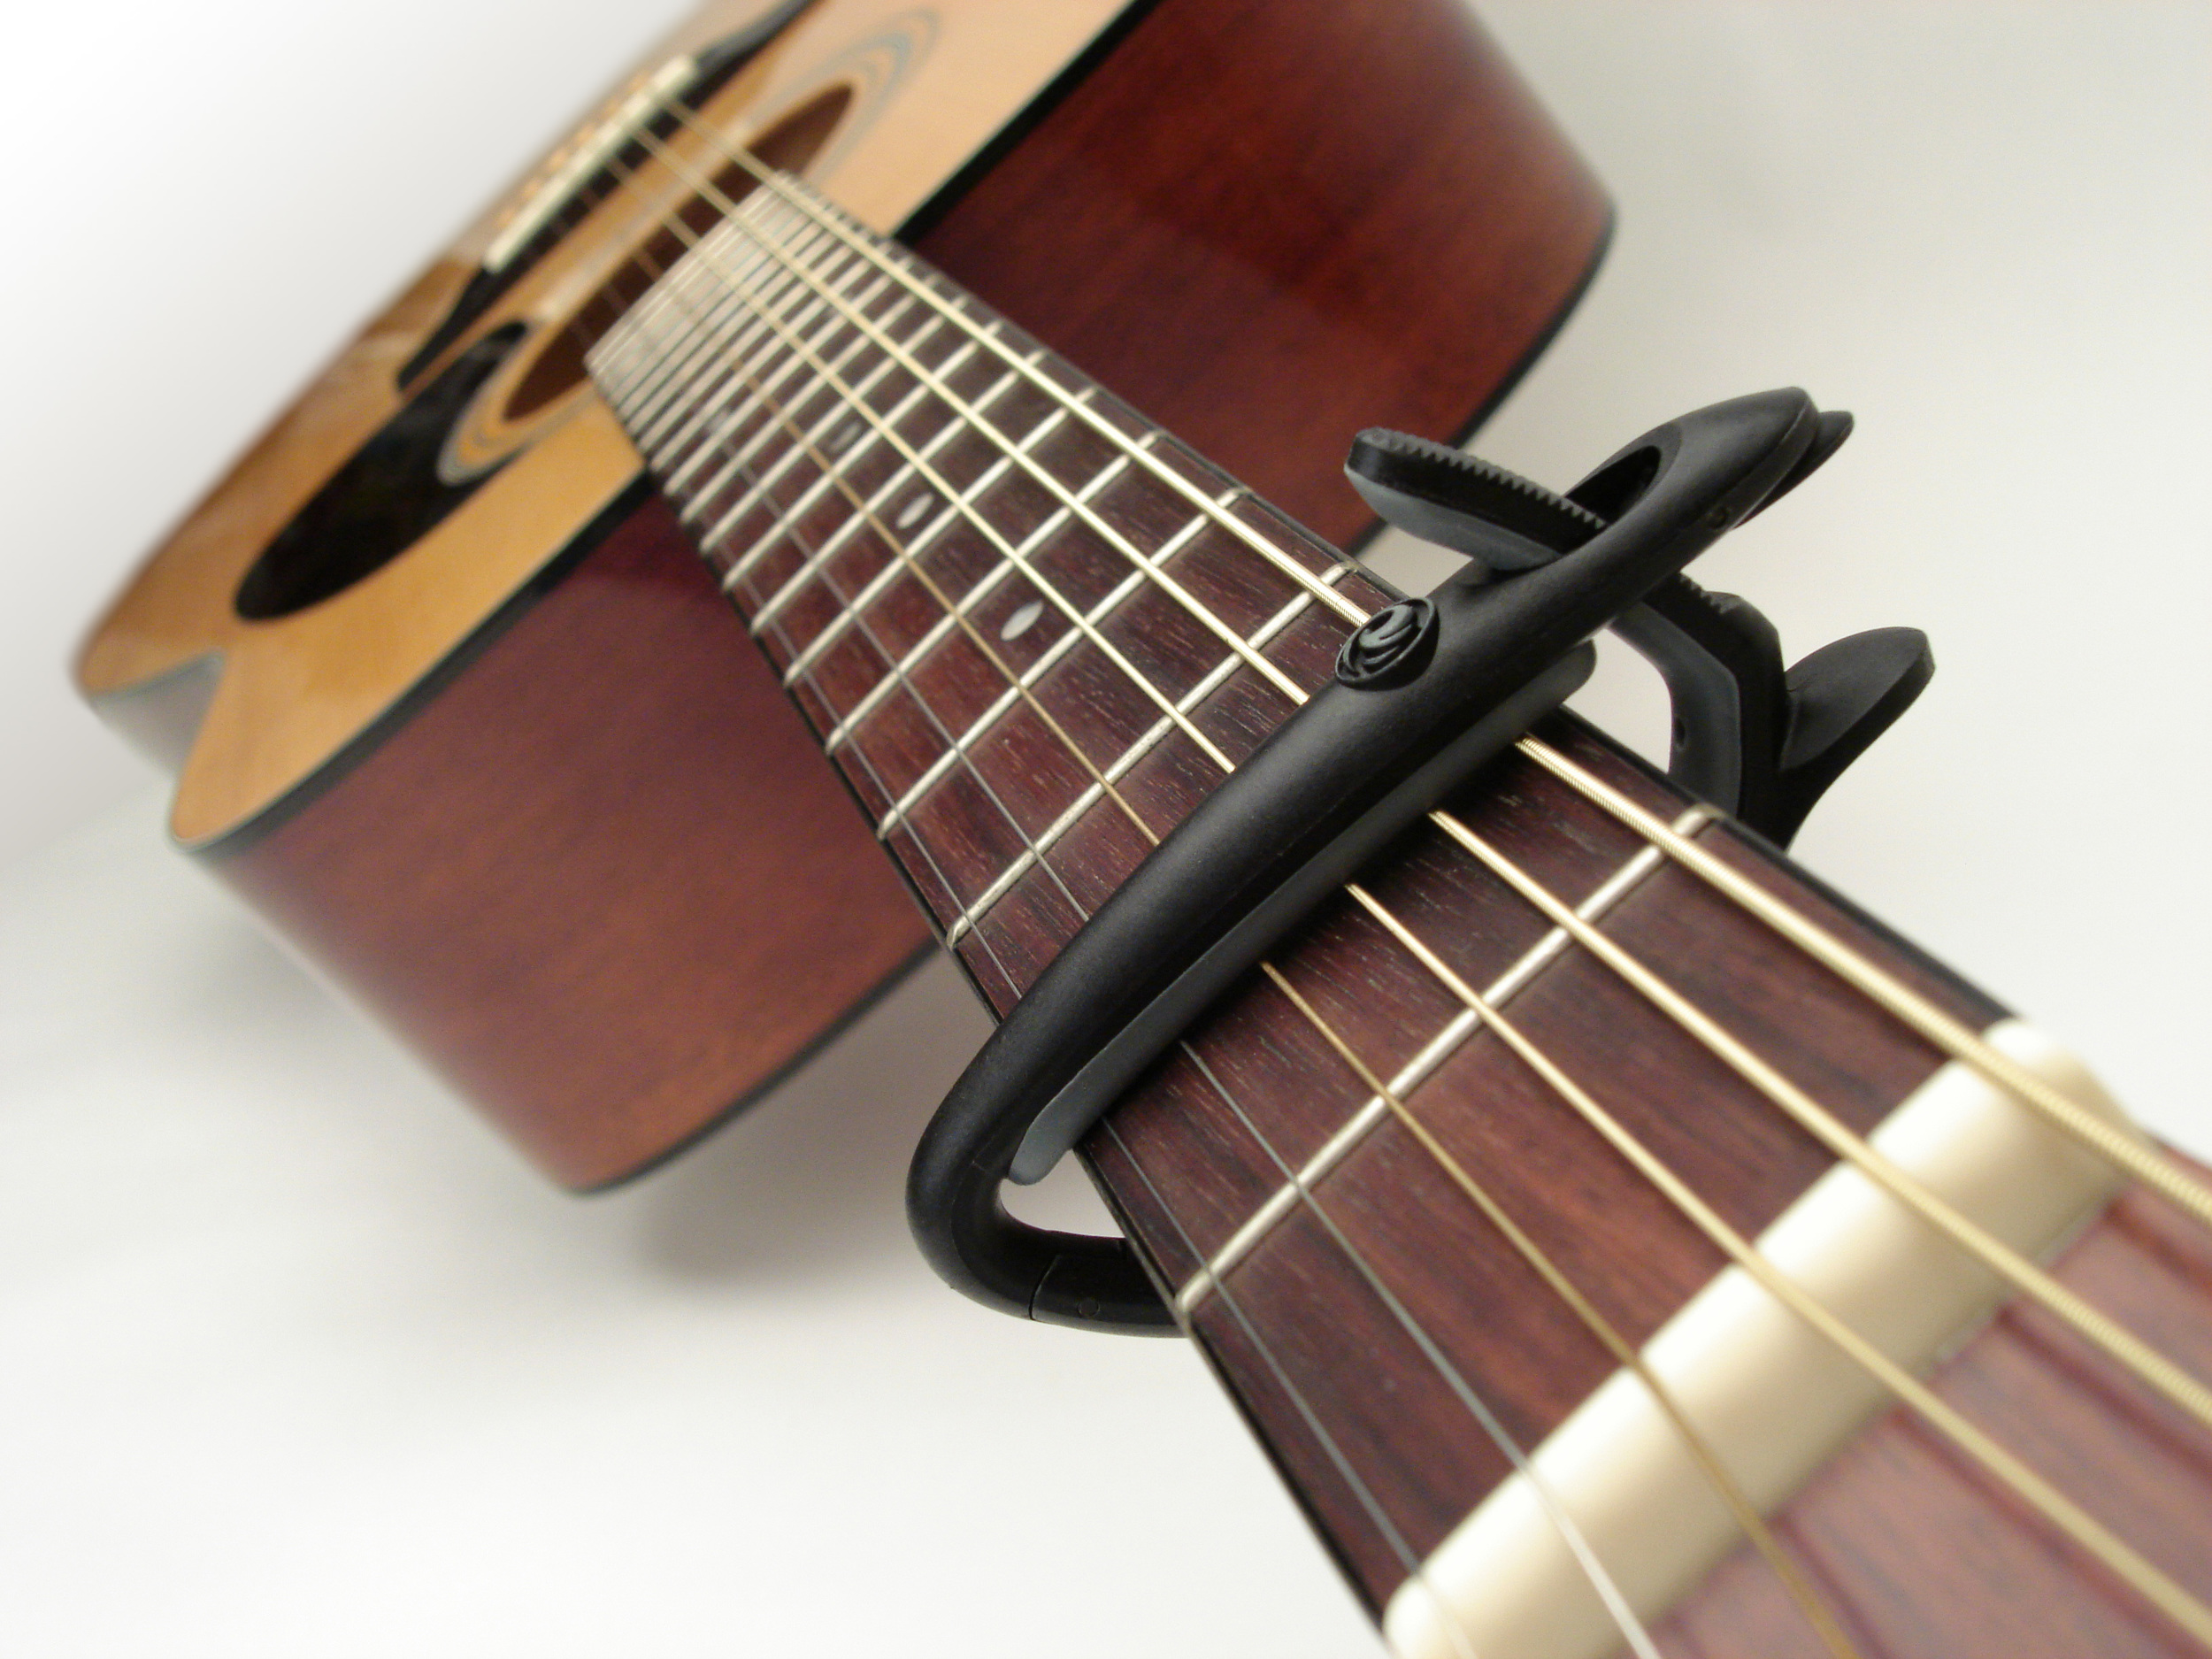 IH16-capo-on-guitar.jpg